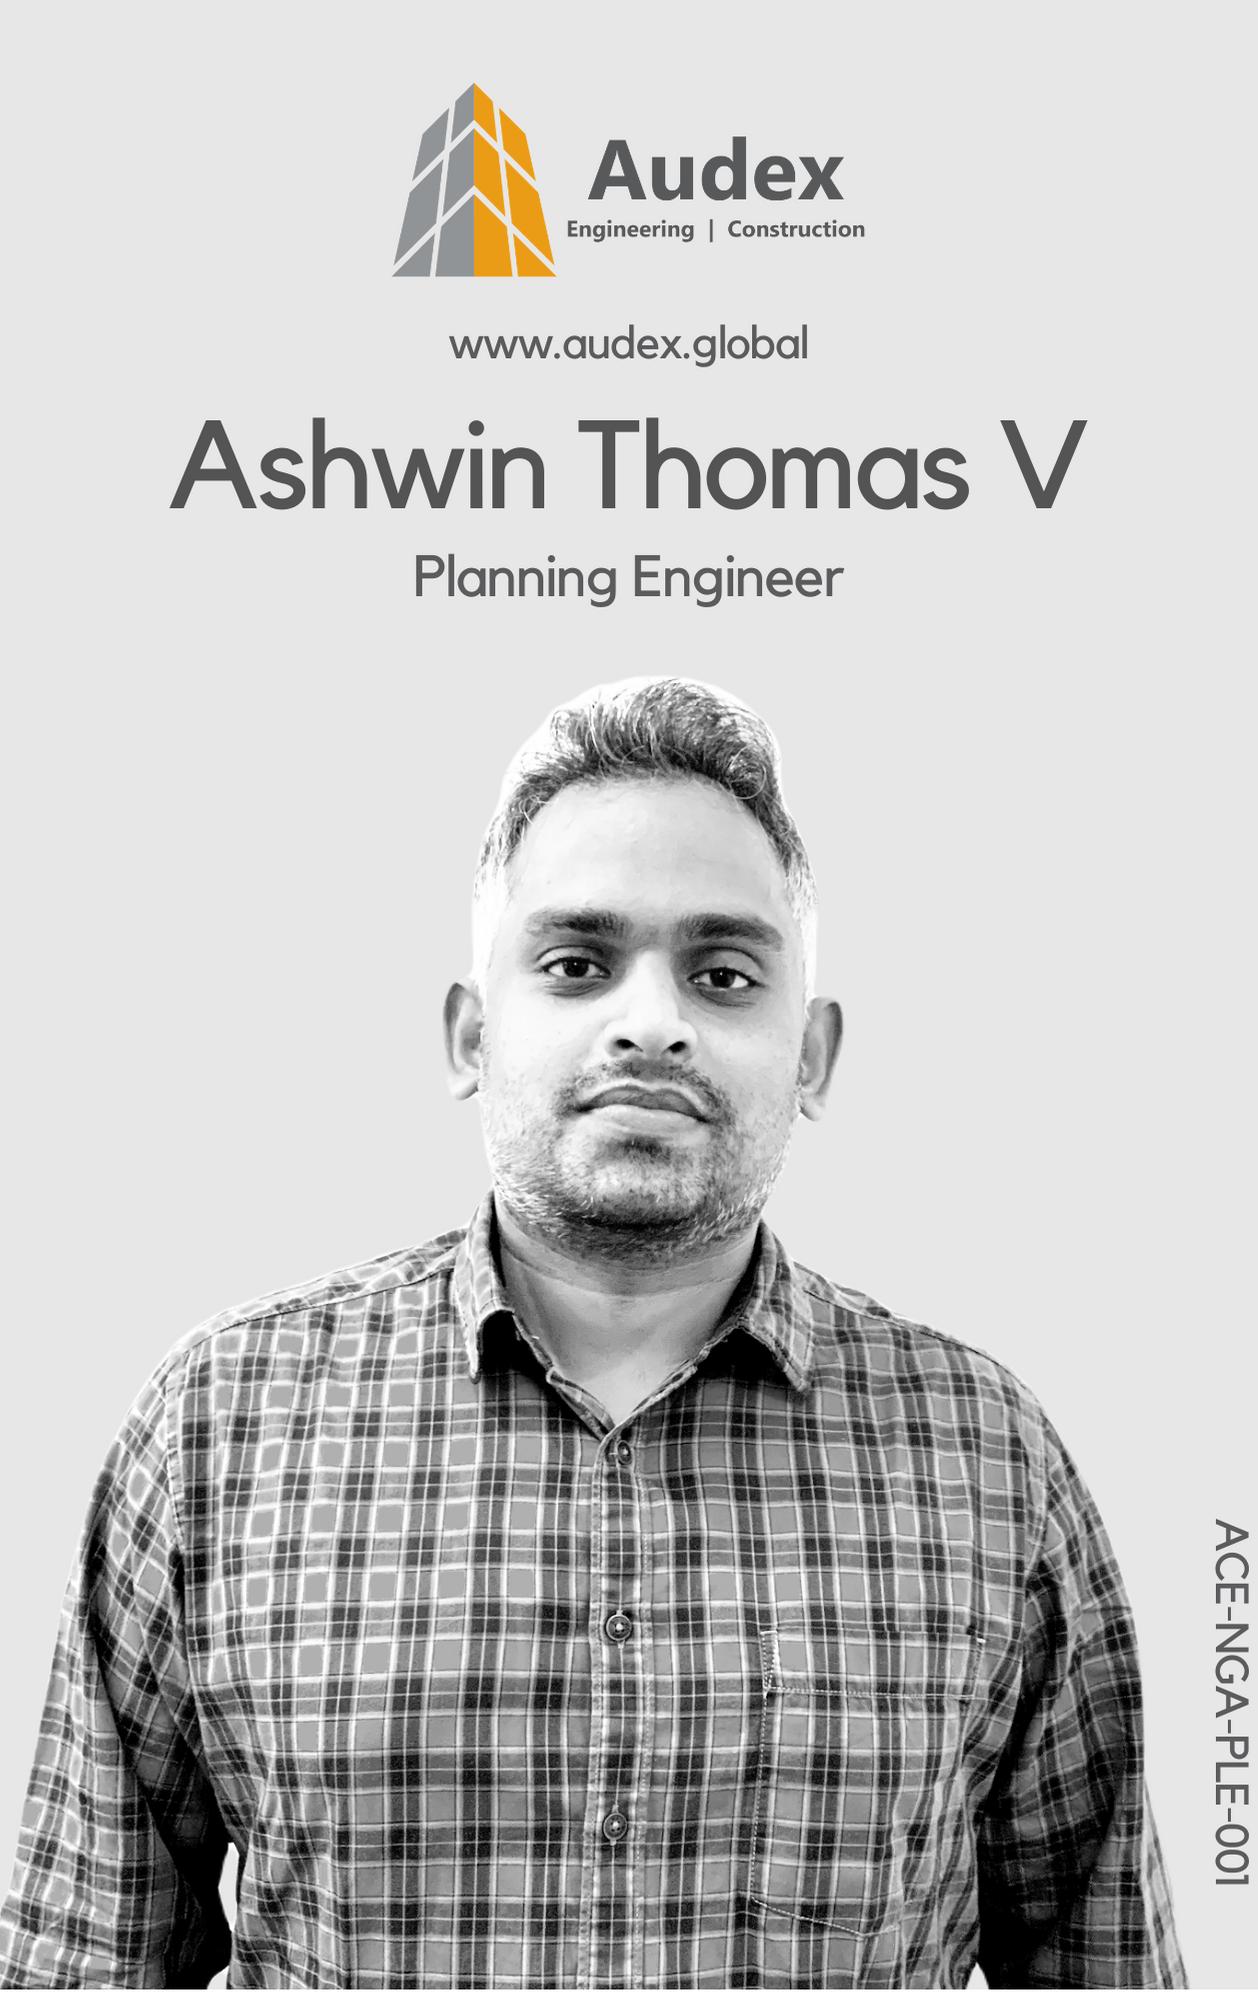 Ashwin Thomas V